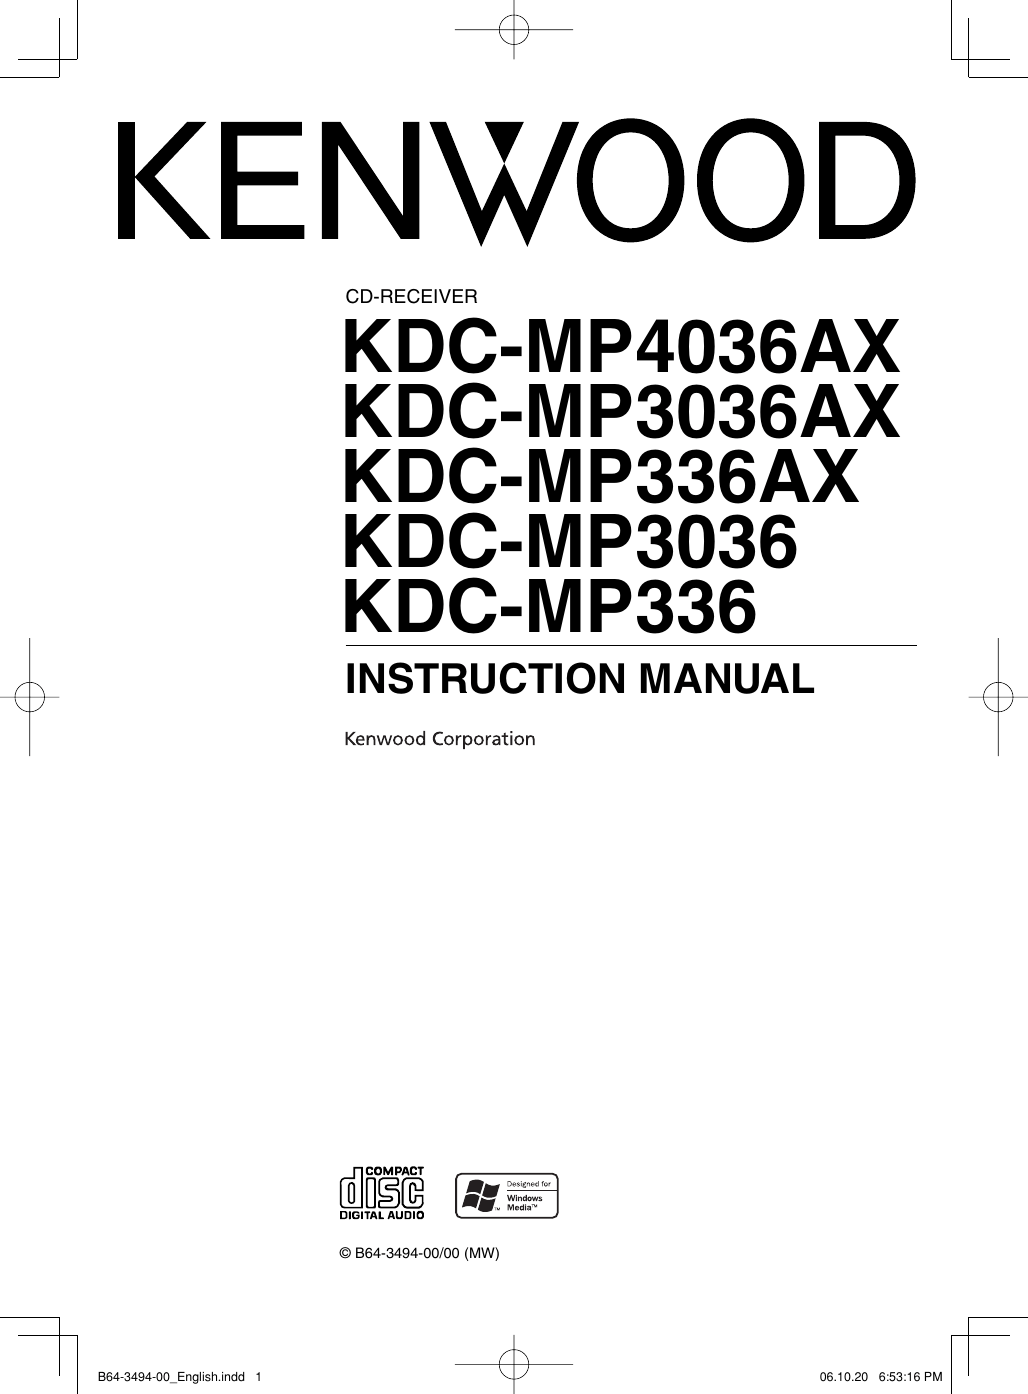 Kenwood Kdc Mp3036 Users Manual B64 3494 00_English